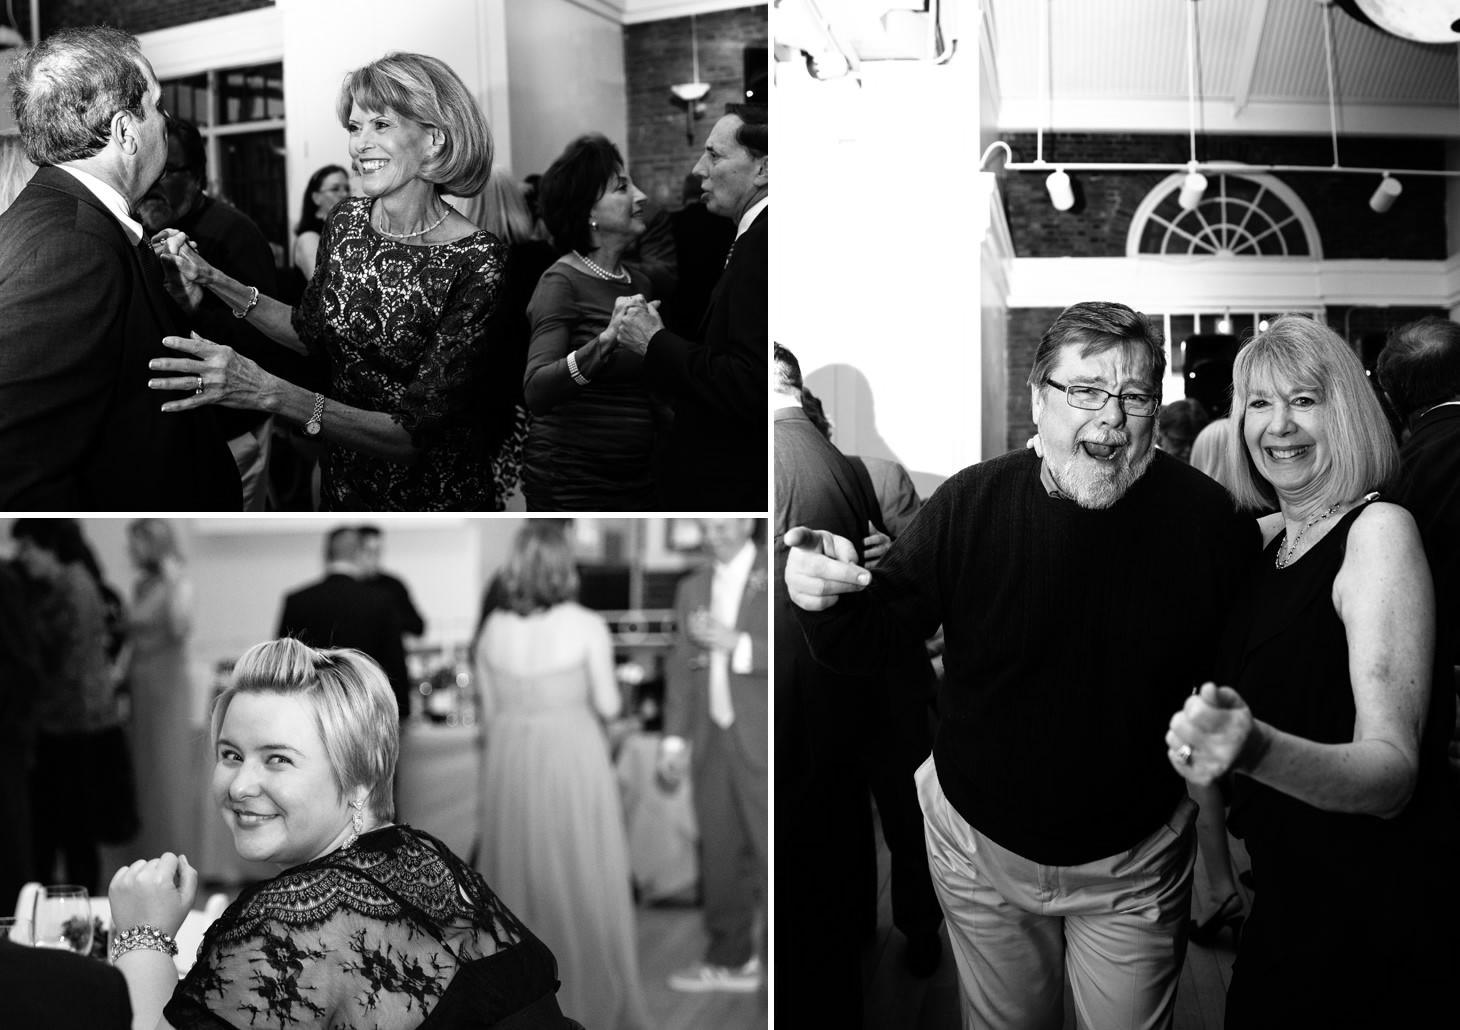 nyc-brooklyn-prospect-park-picnic-house-wedding-smitten-chickens-nerdy-65.jpg